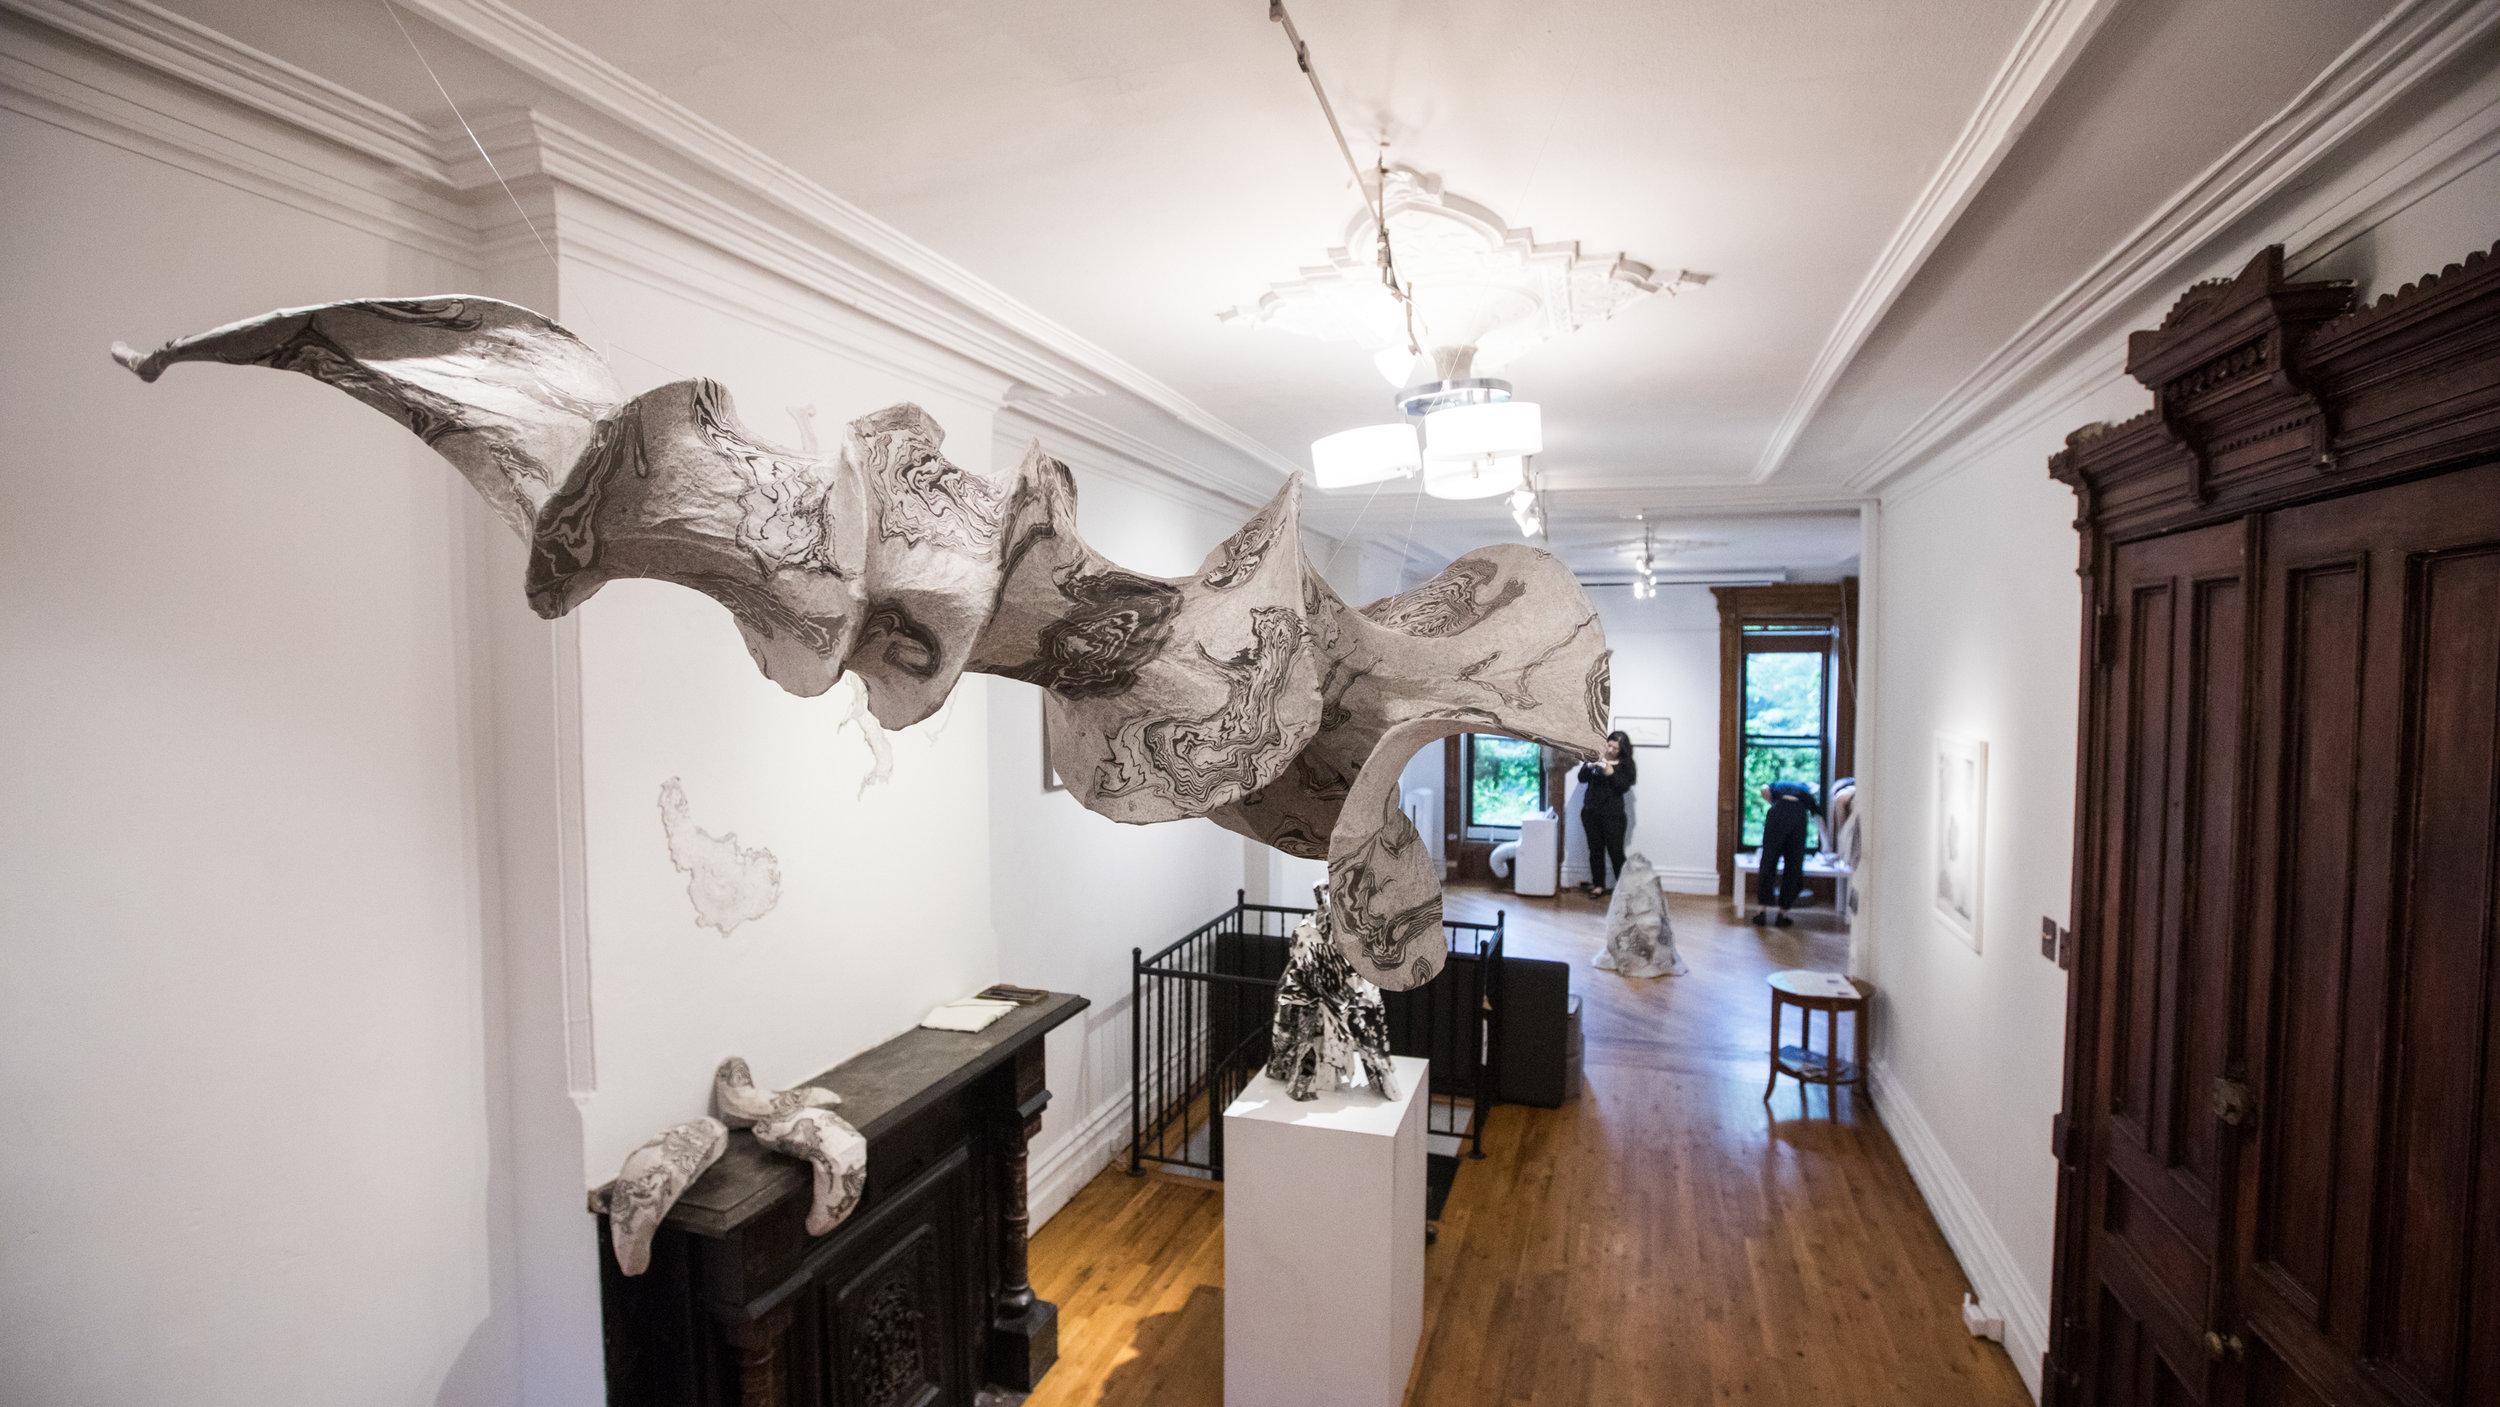 Jisook Kim & Hilda Shen: Orogenies  installation view. Photograph by Nadia Peichao Lin. © Jisook Kim and Hilda Shen, courtesy Fou Gallery.